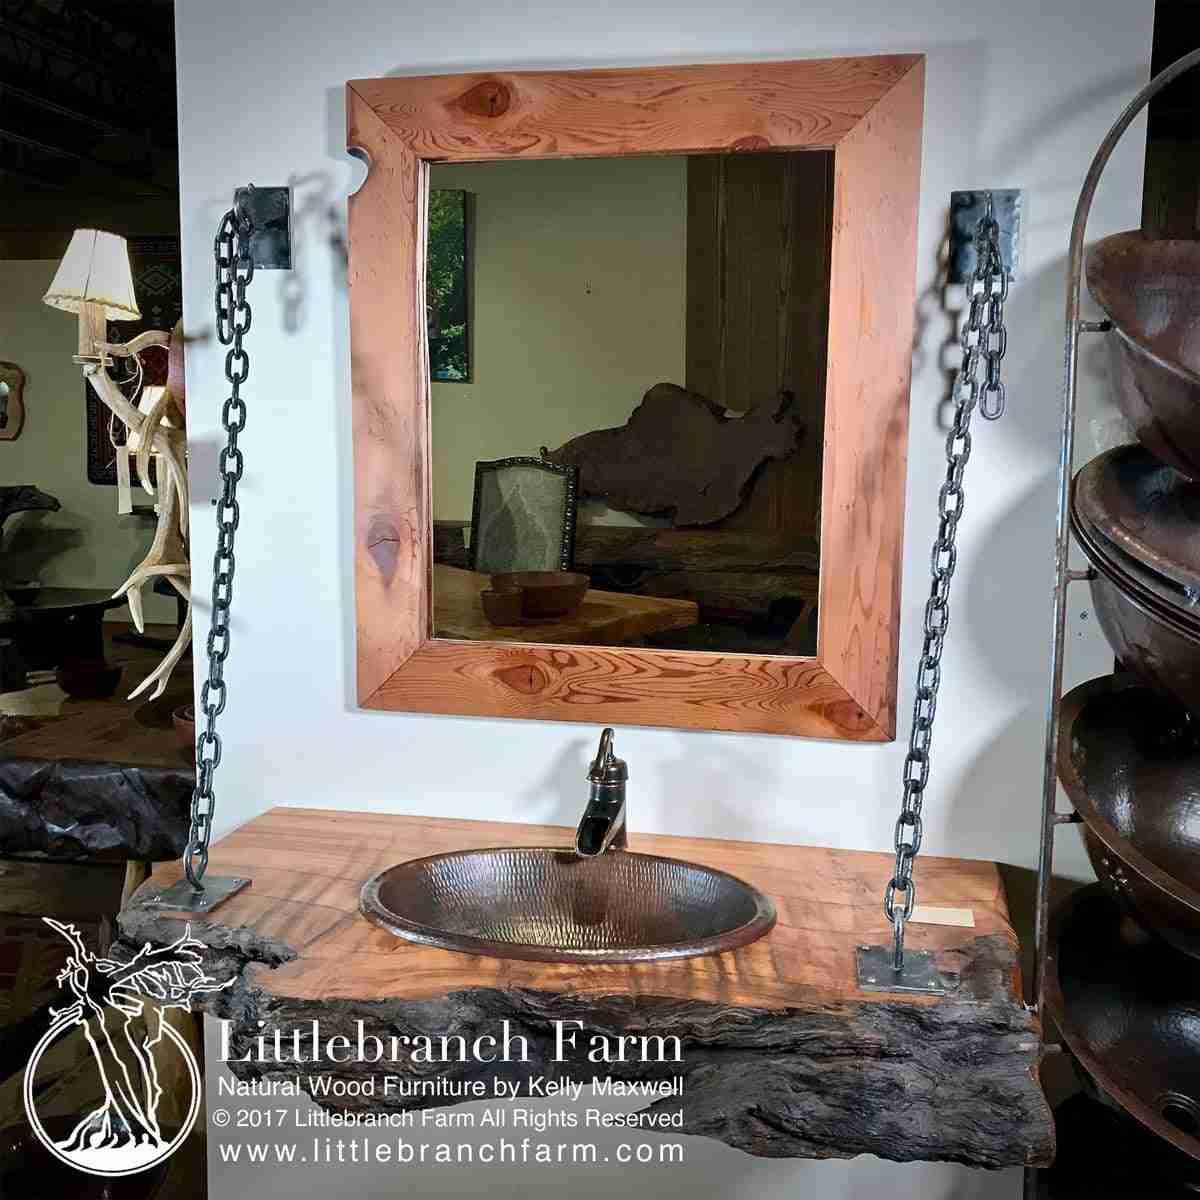 Wood Slab Rustic Bathroom Vanity 201 Littlebranch Farm